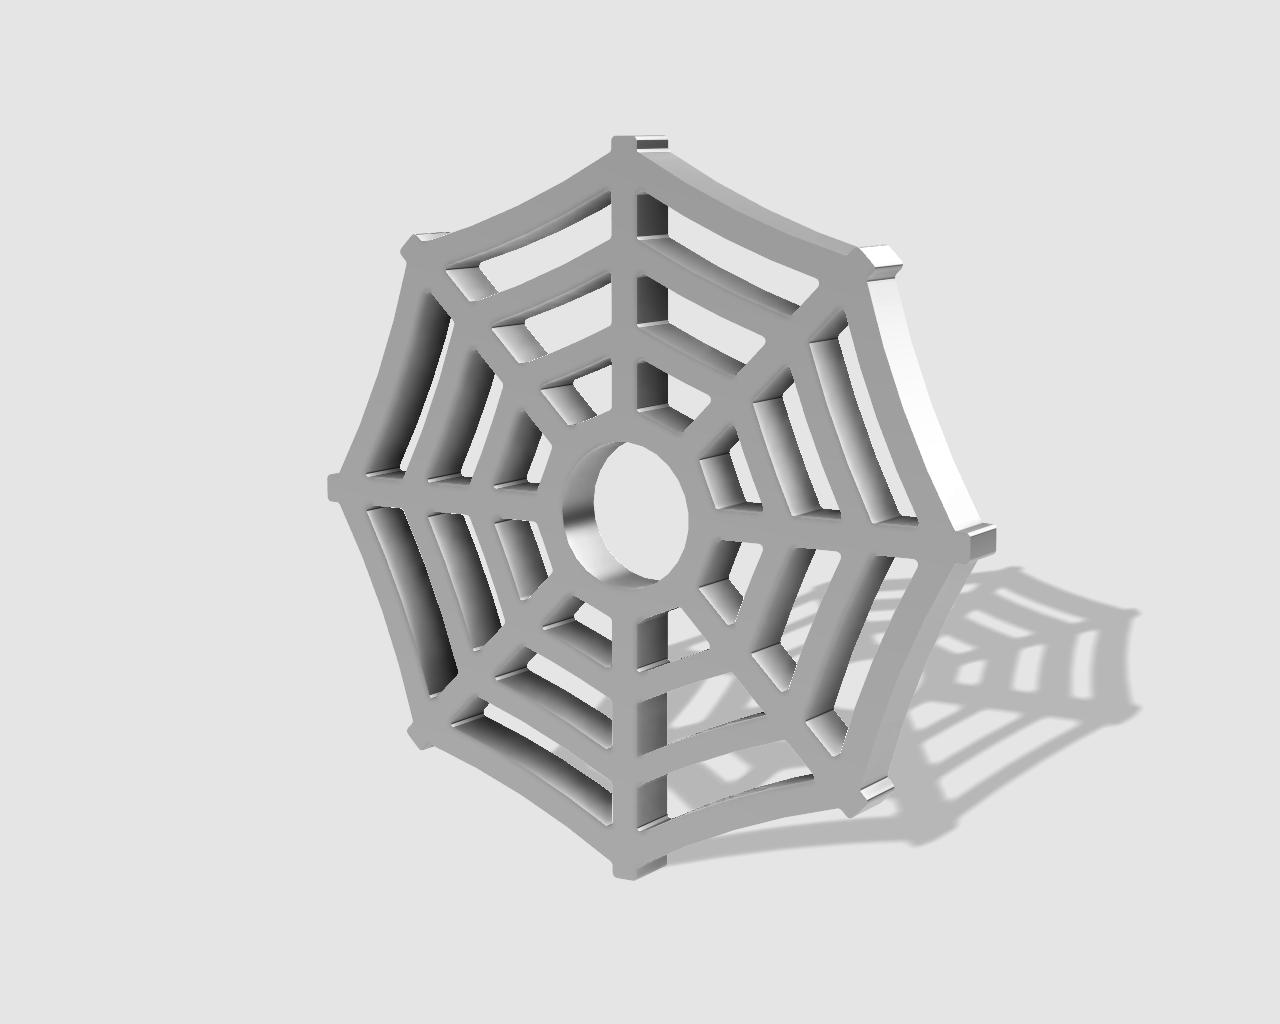 45rpm adaptor - spiders web